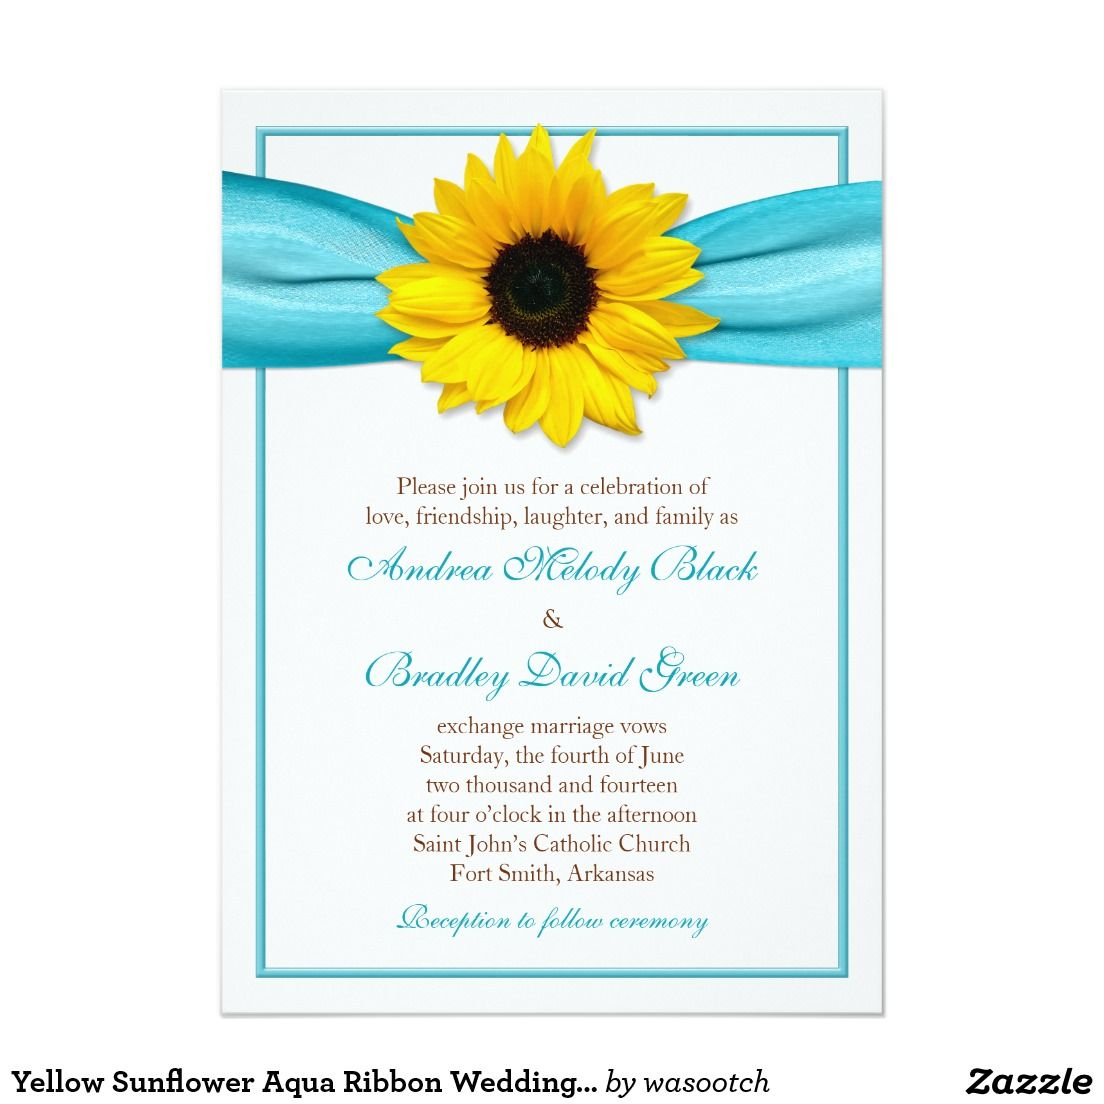 Yellow Sunflower Aqua Ribbon Wedding Invitation 5\